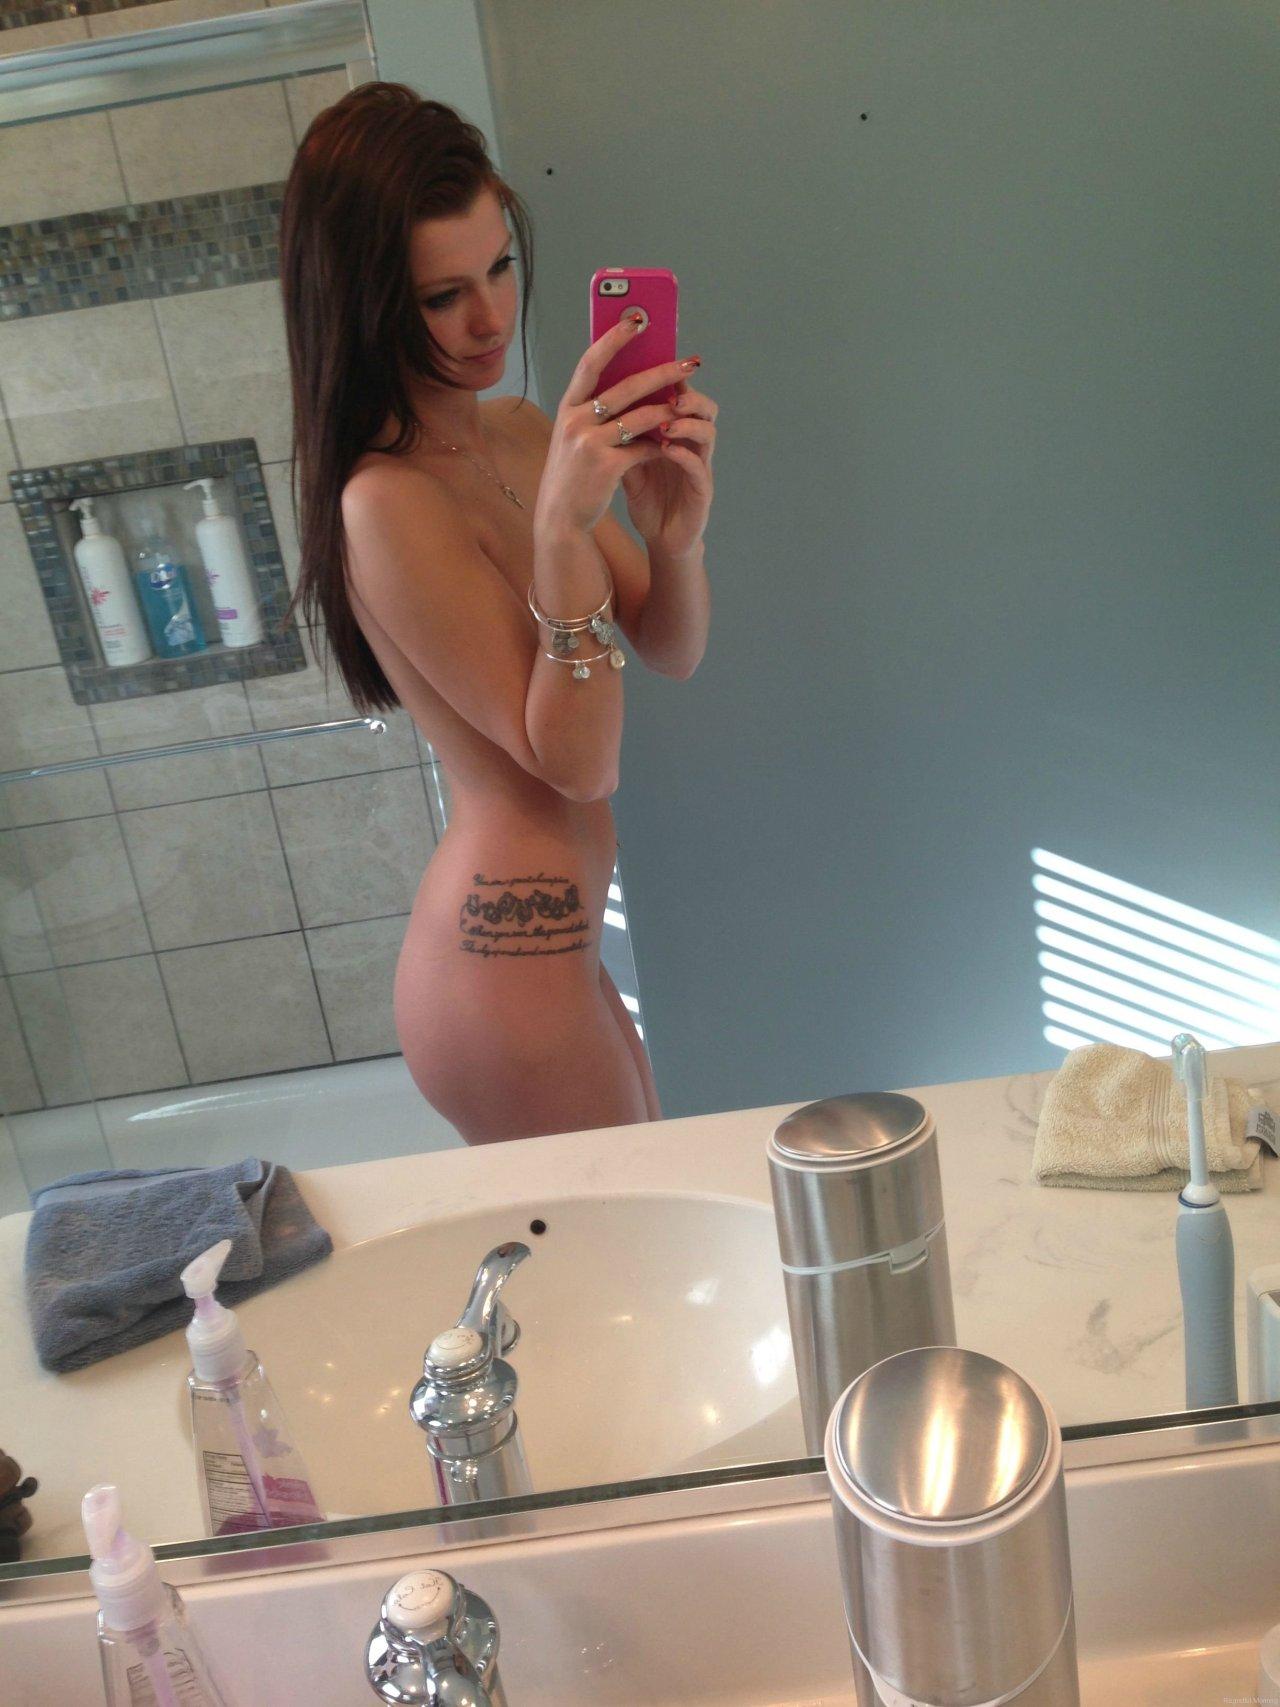 Fille nue du 69 rdv sexe et photo porno